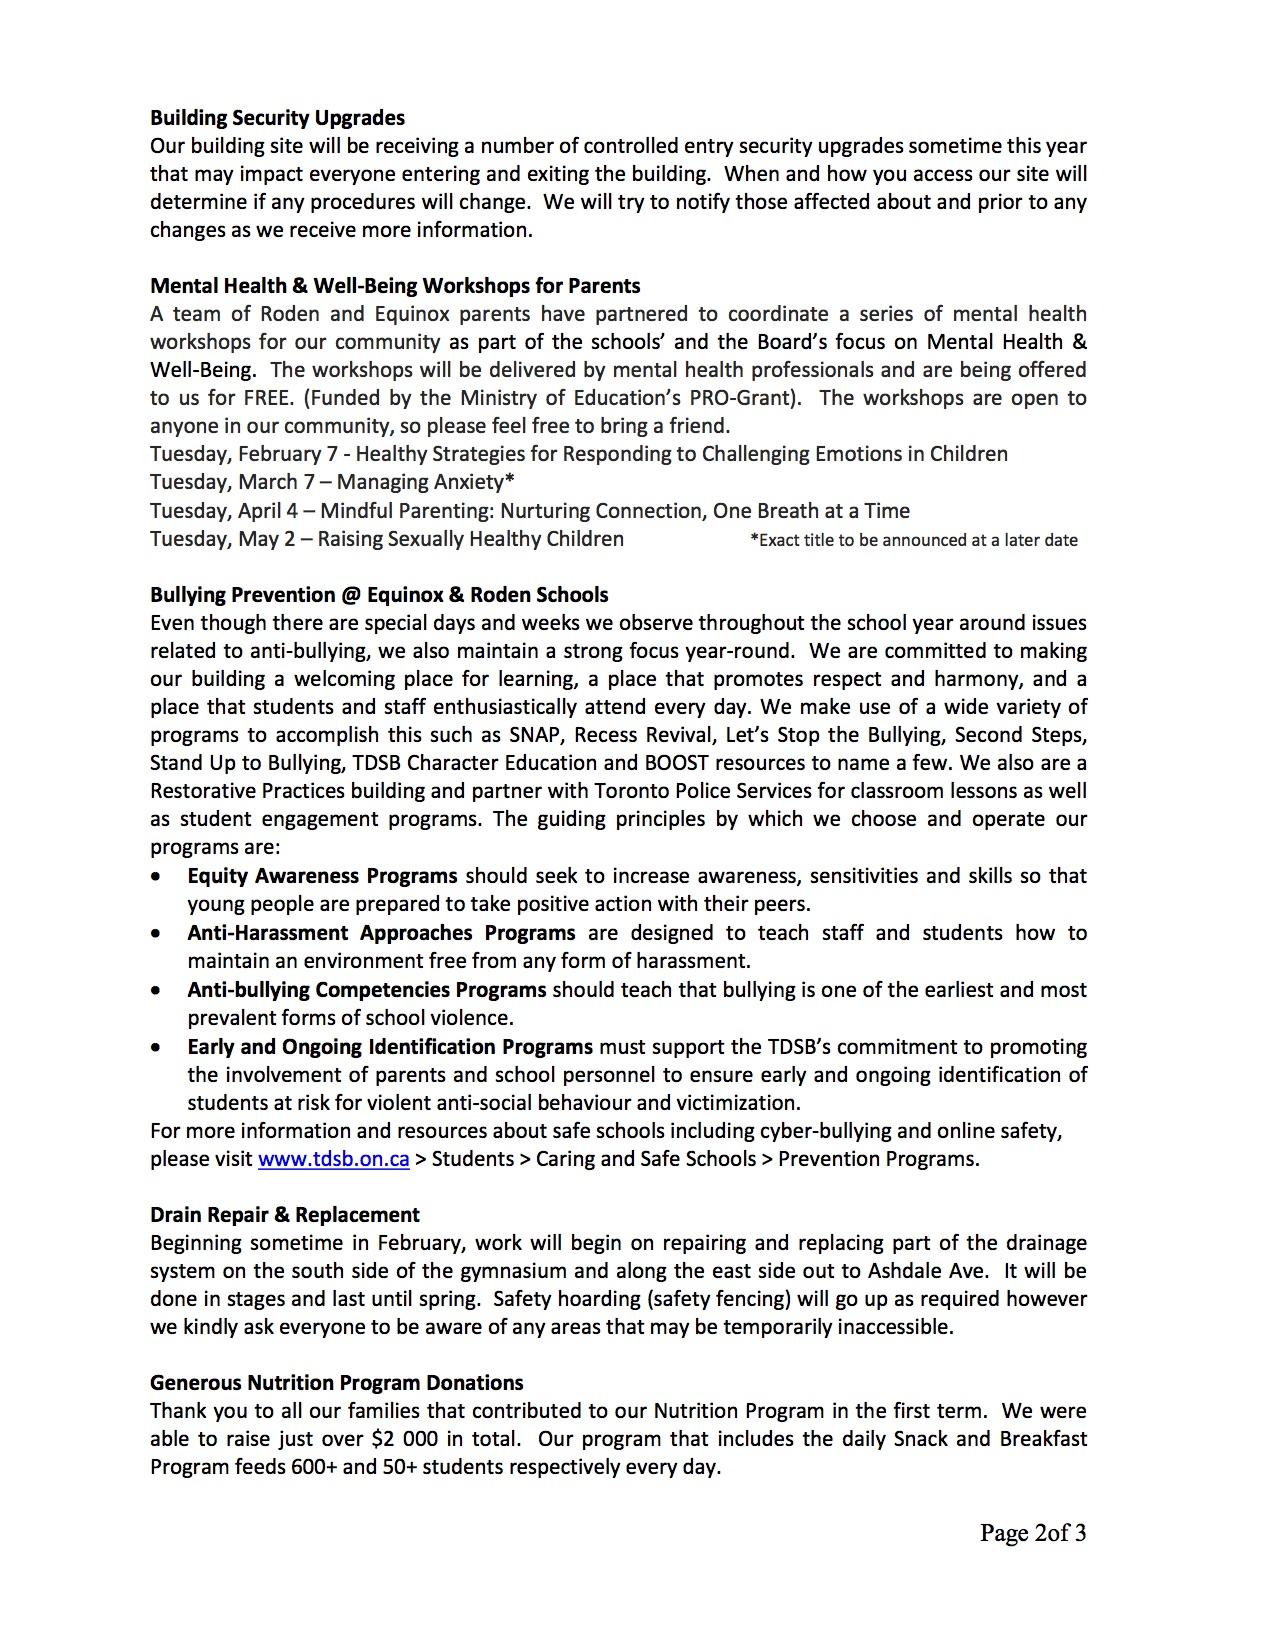 Roden Newsletter 17-02-02p2